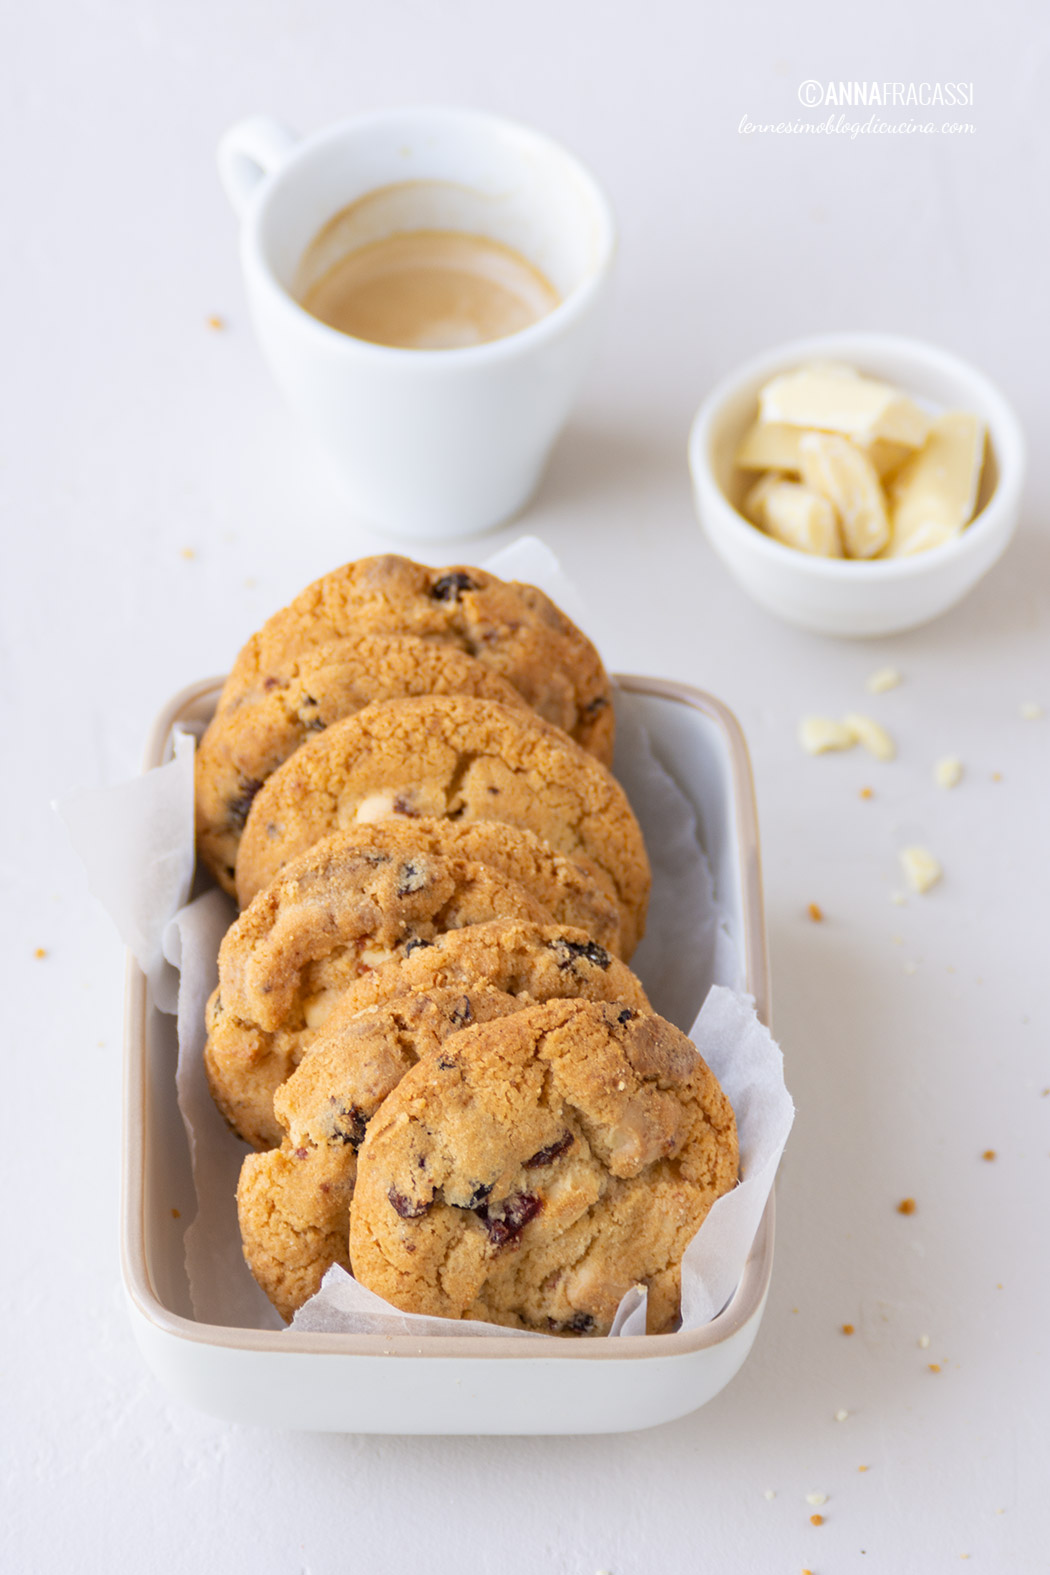 Ricetta Cookies Cioccolato Bianco E Mirtilli.Biscotti Al Cioccolato Bianco E Mirtilli Rossi L Ennesimo Blog Di Cucina